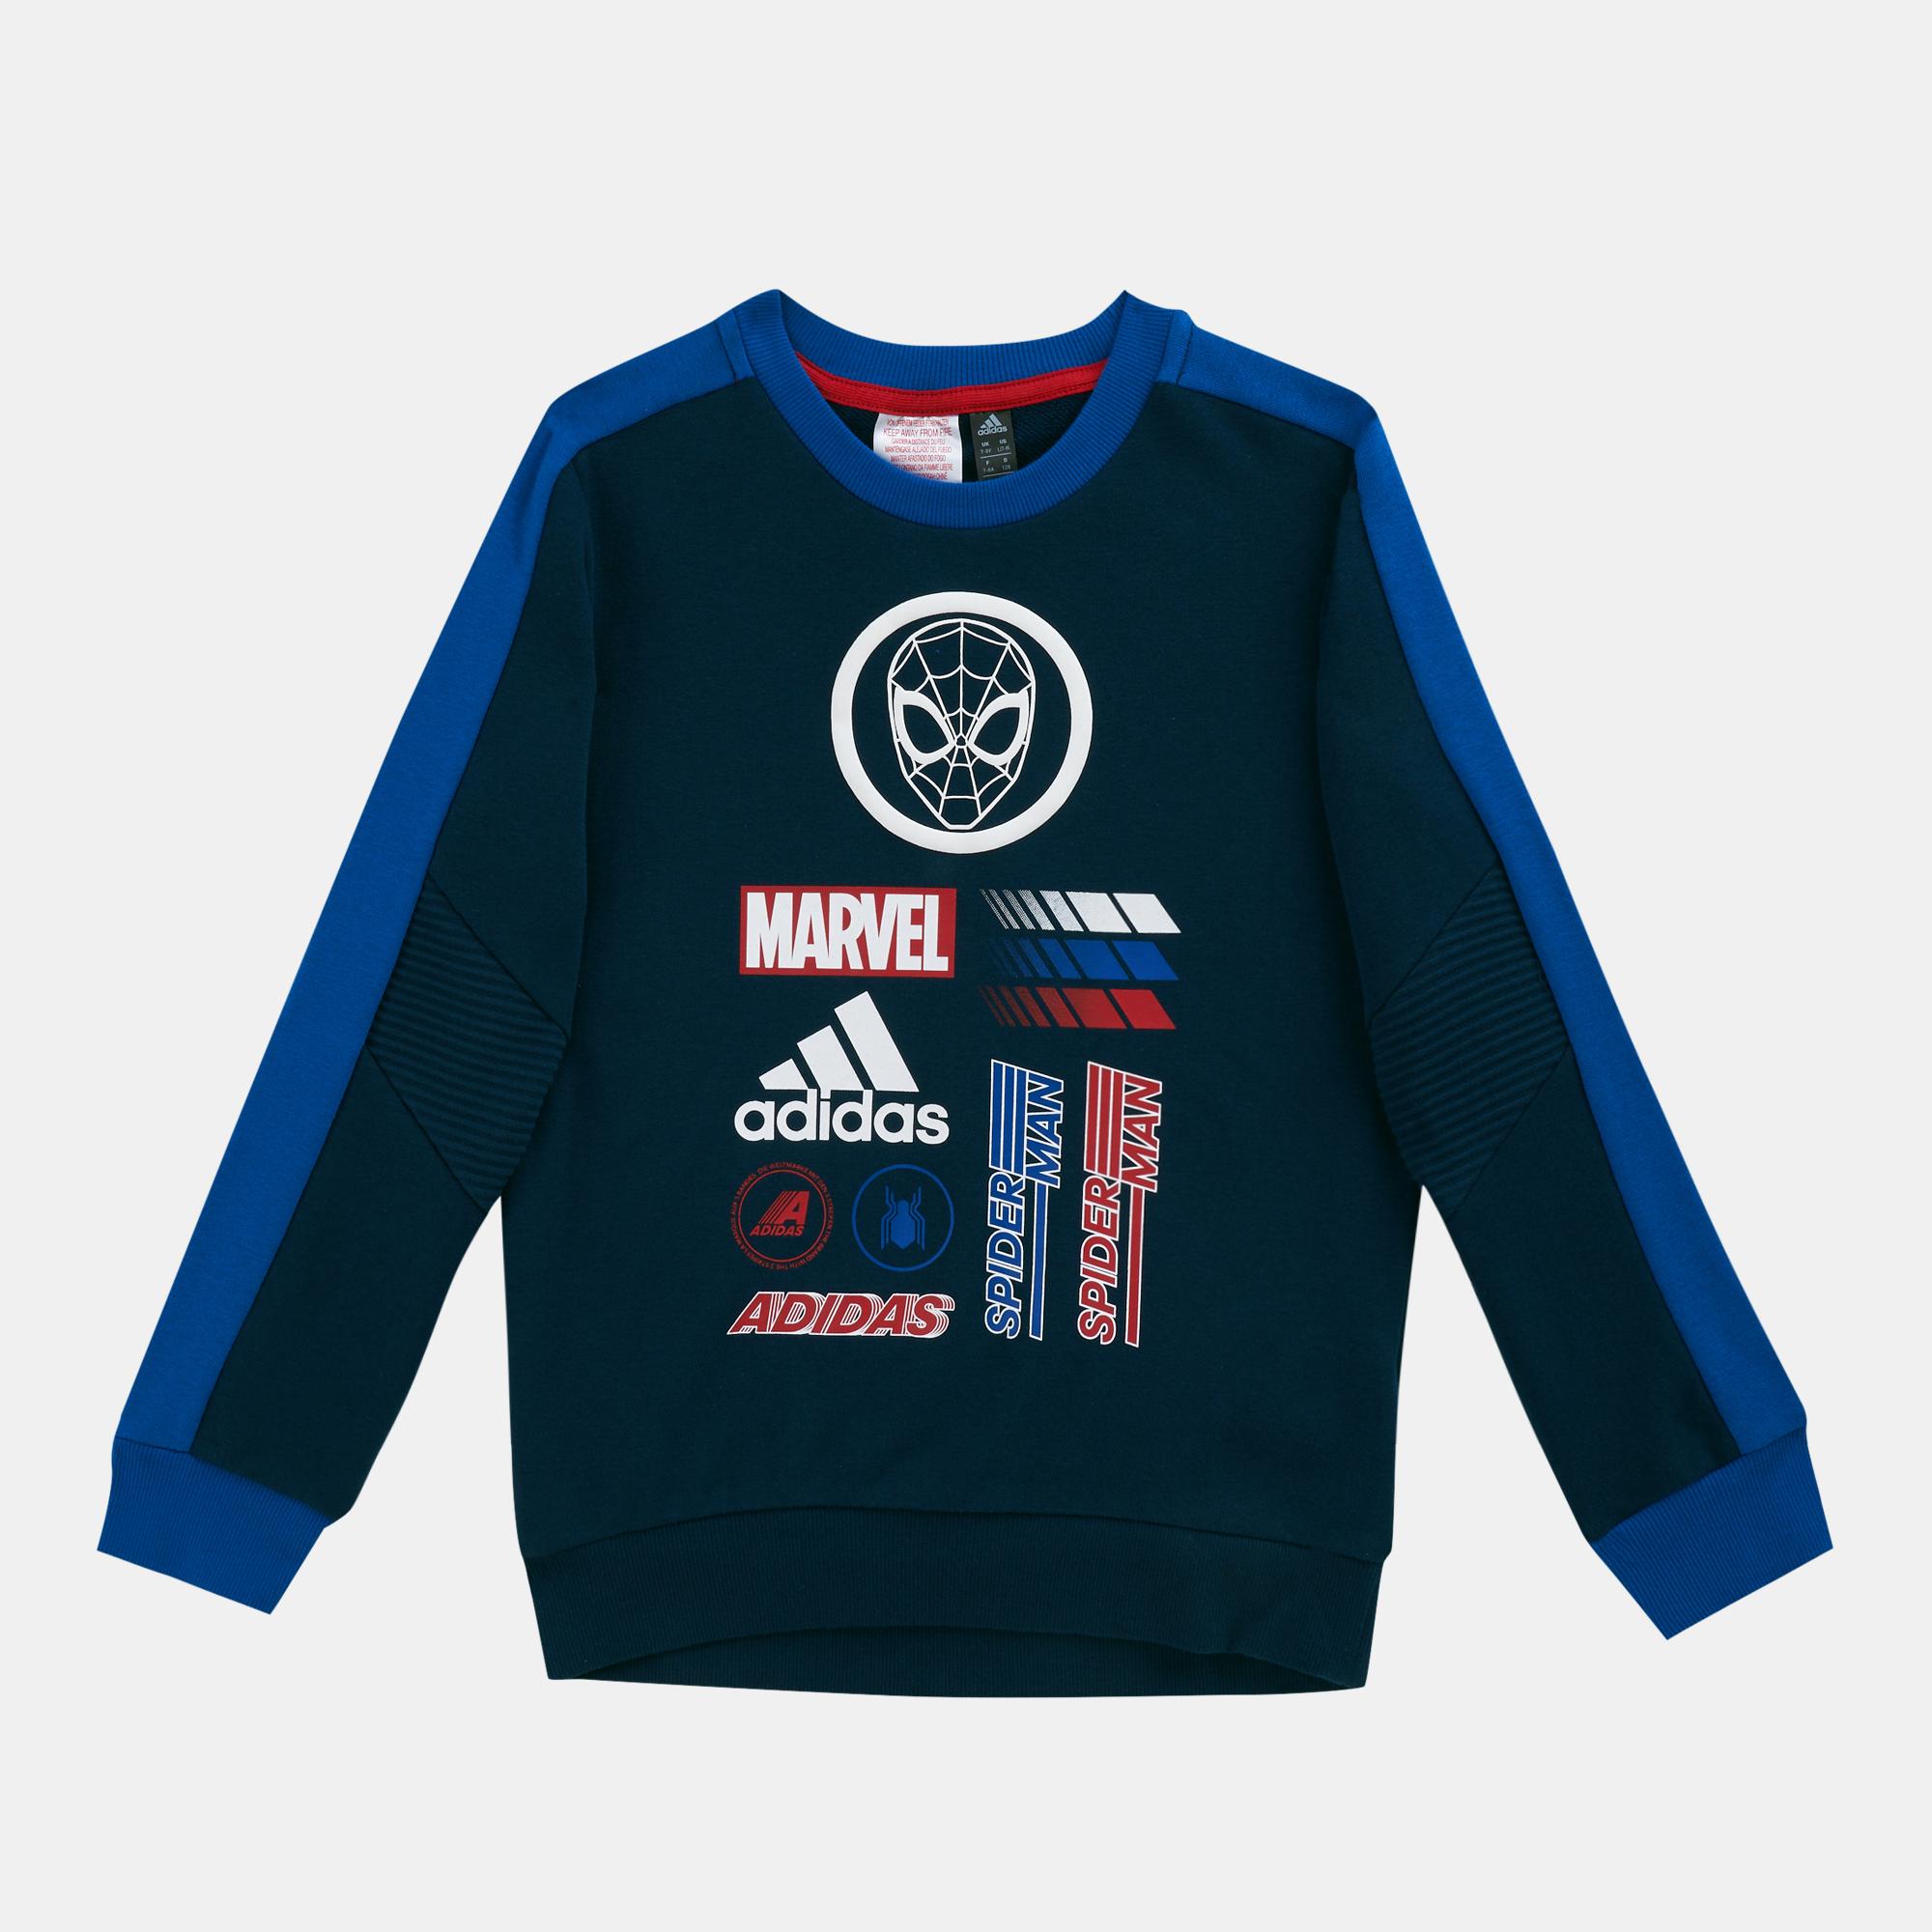 3920db70015 adidas Kids' Marvel Spider-Man Crew Sweatshirt (Older Kids) | Sweatshirts |  Hoodies and Sweatshirts | Clothing | Kids | SSS